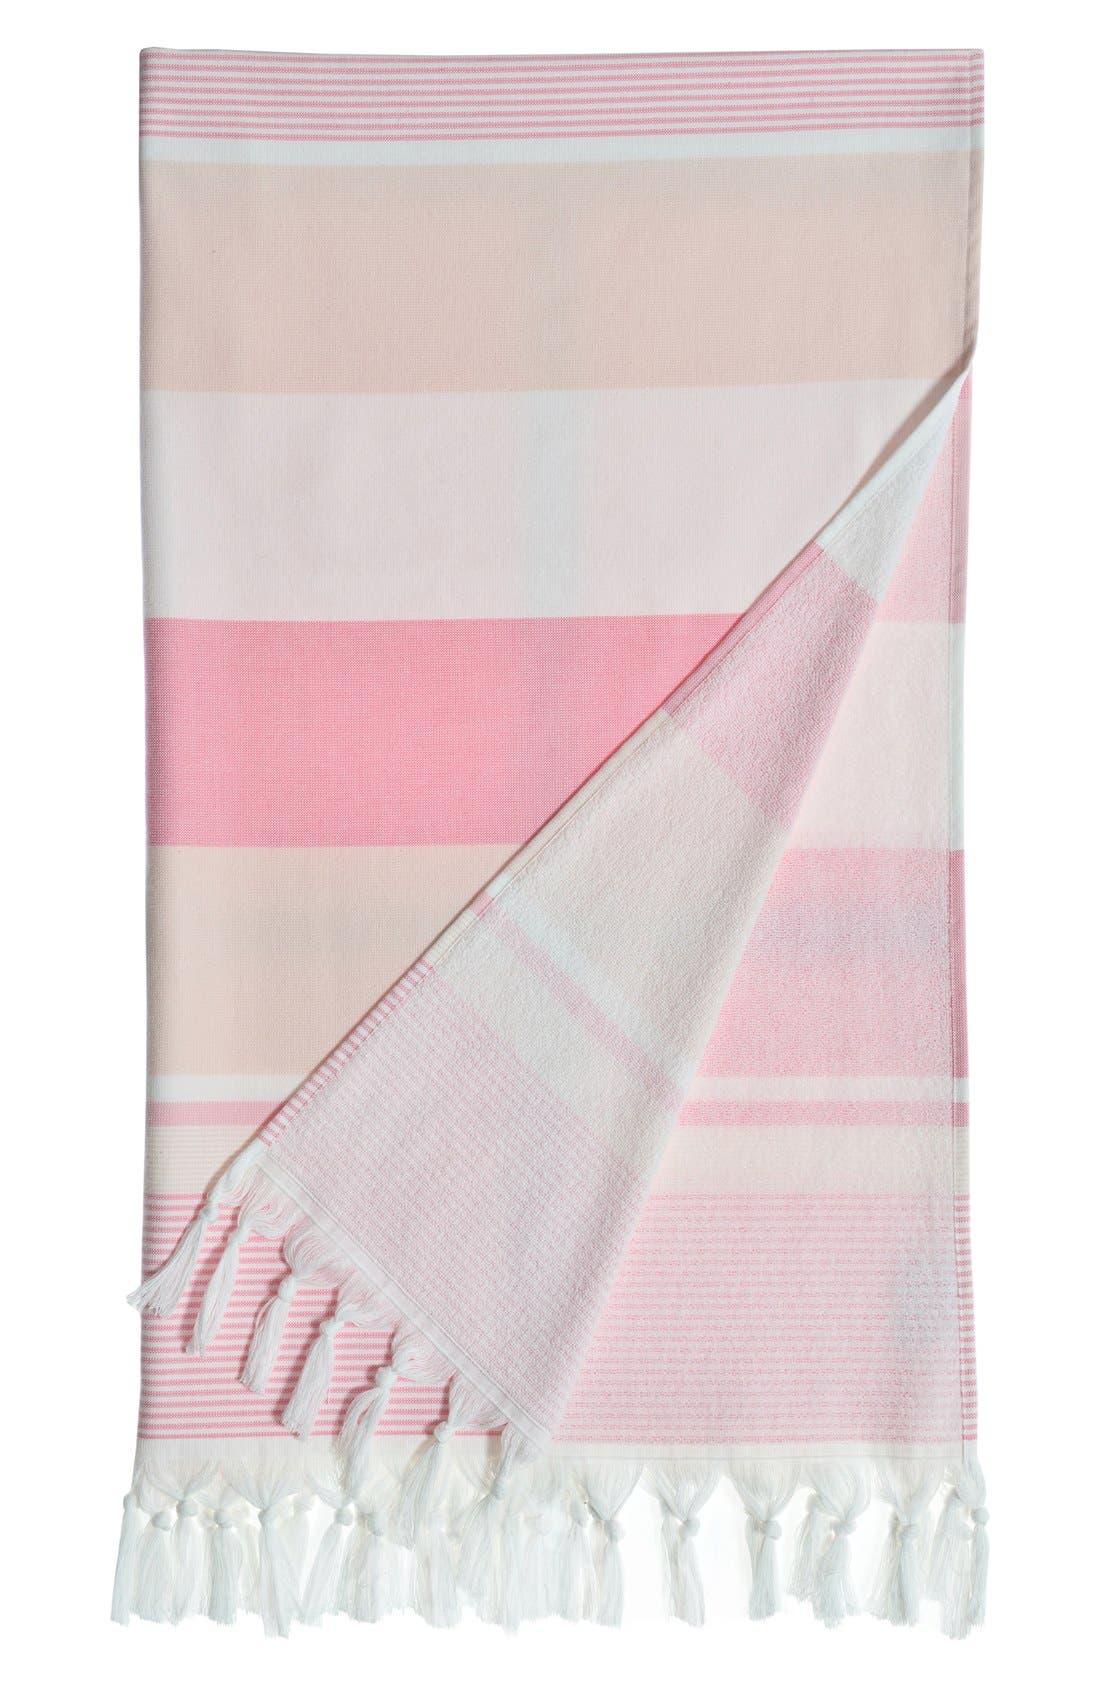 Main Image - Linum Home Textiles 'Summer Loving' Turkish Pestemal Towel